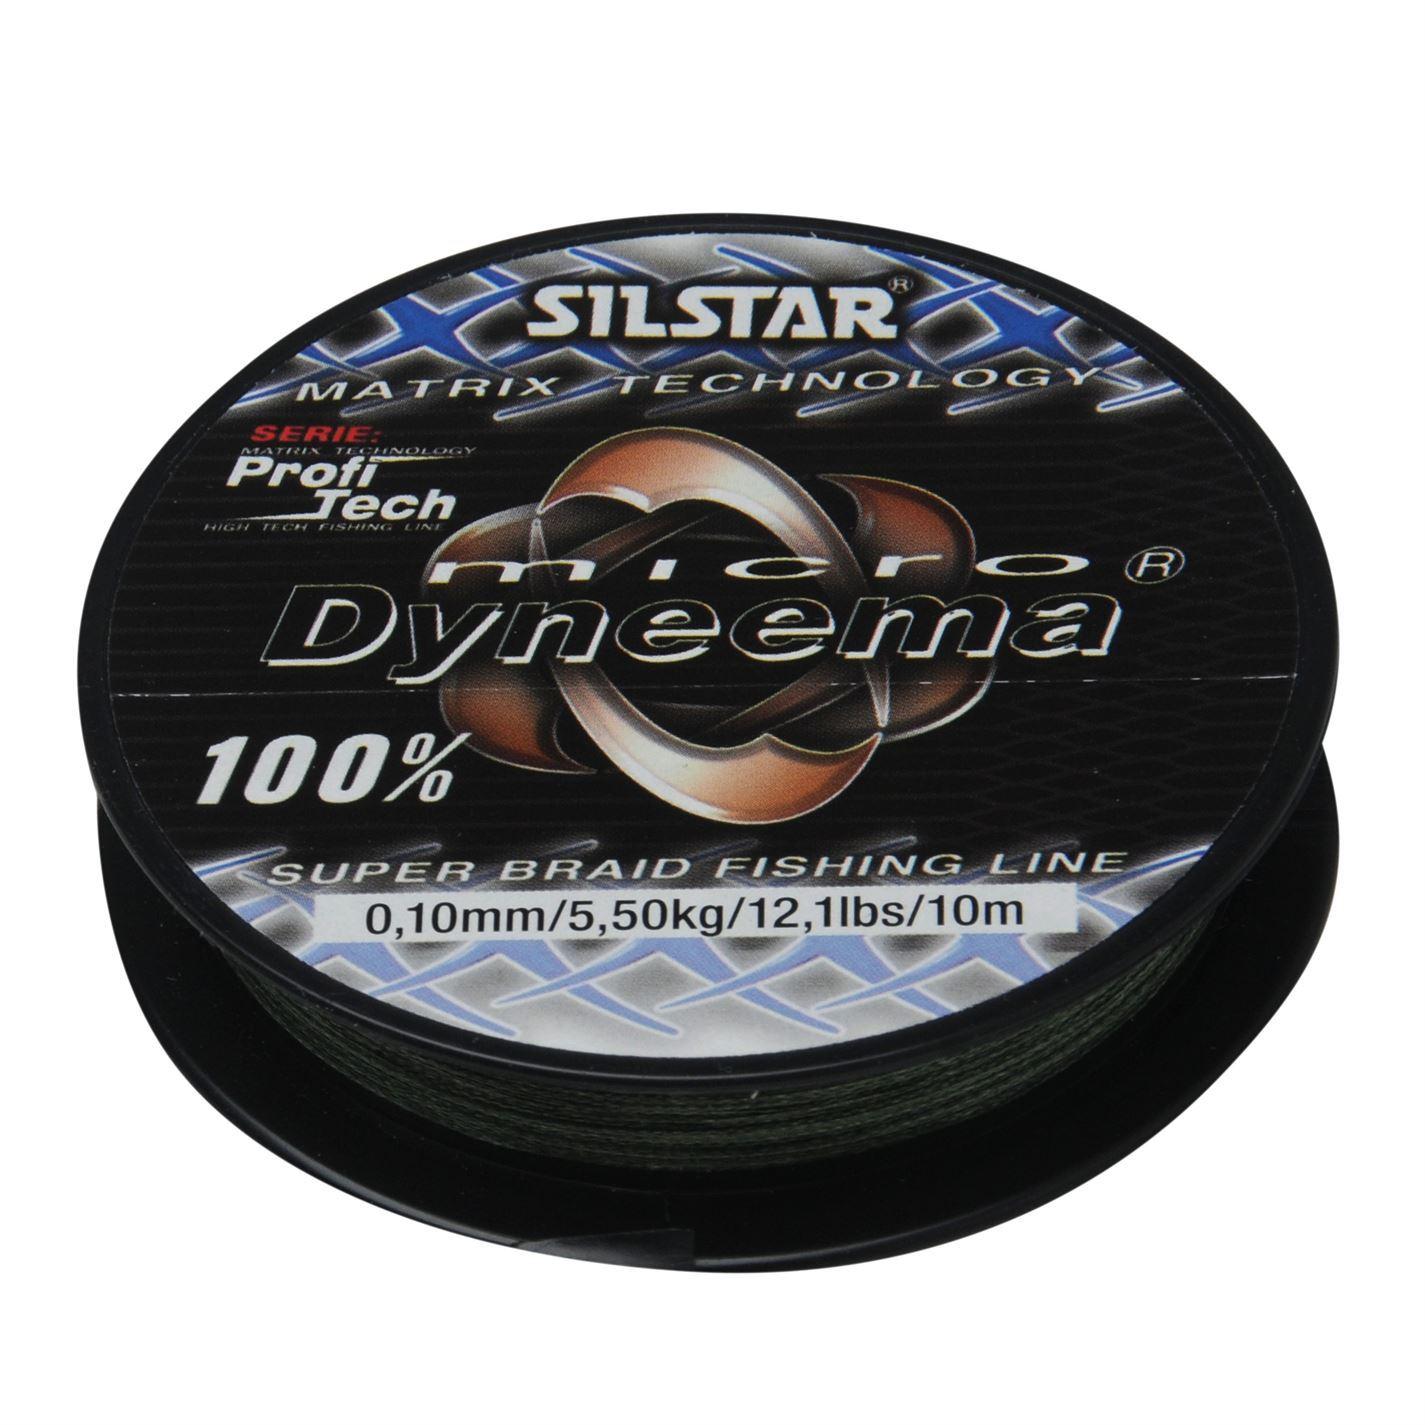 Silstar dyneema briad fishing line matrix technology ebay for Ebay fishing line